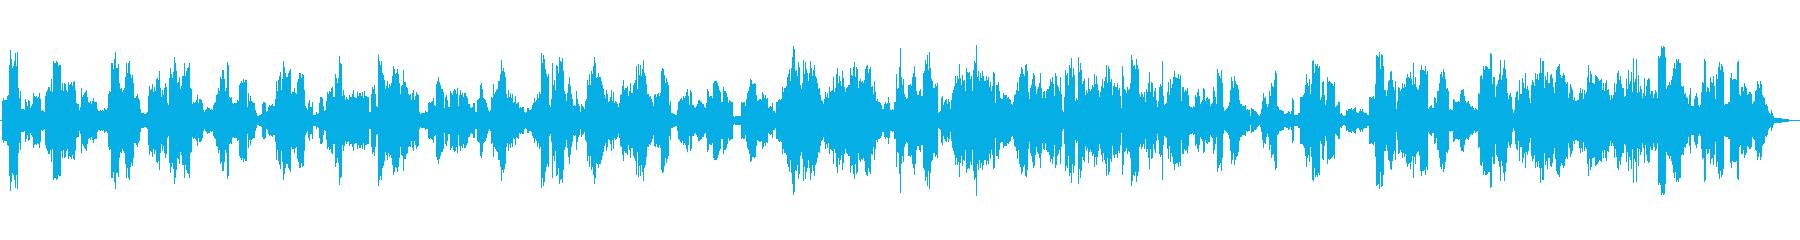 KANT近未来ロボット言語効果音3の再生済みの波形